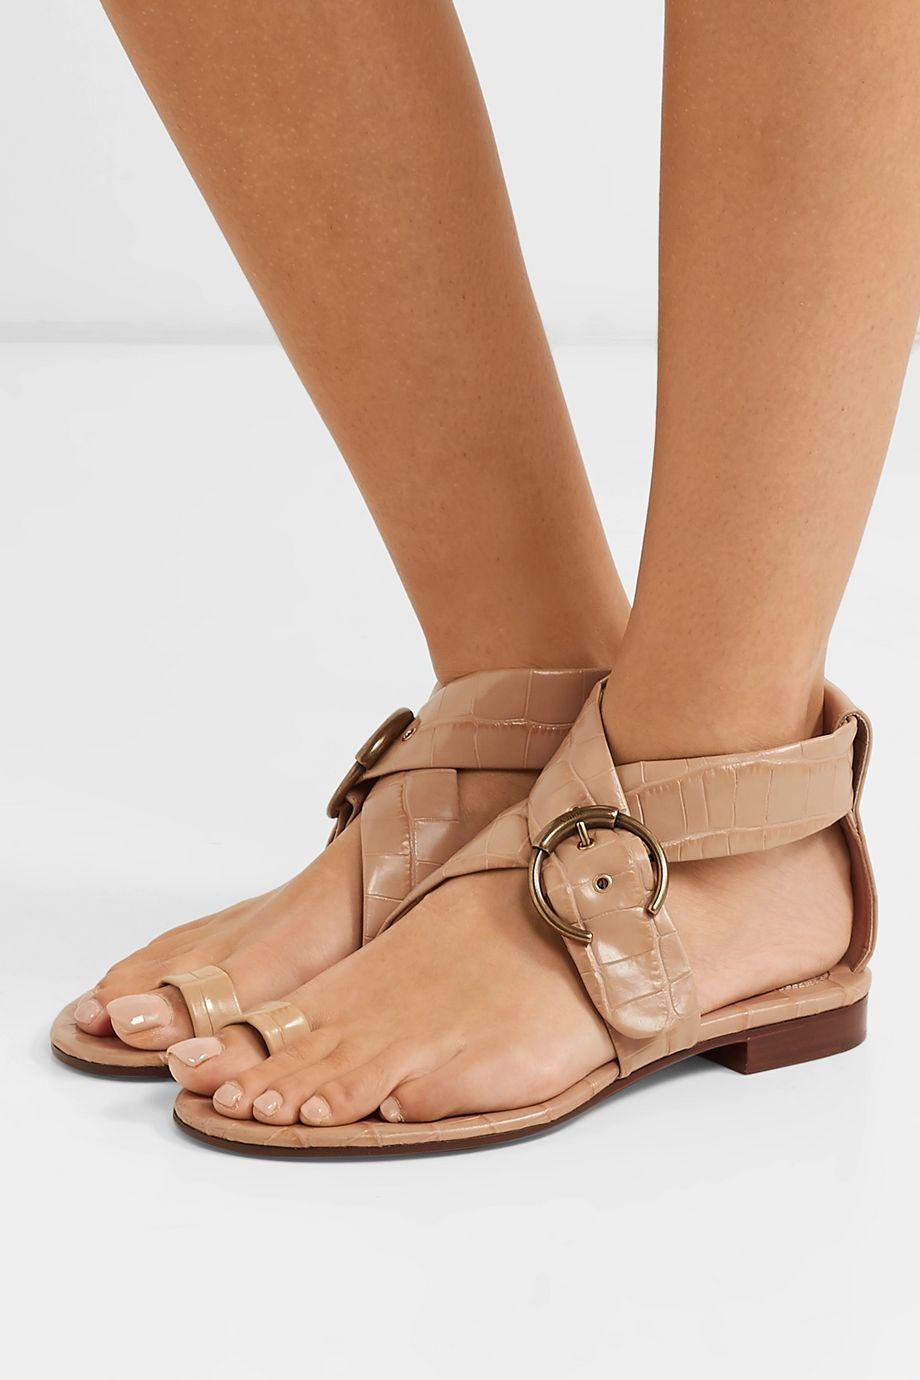 Chloé Roy buckled croc-effect leather sandals